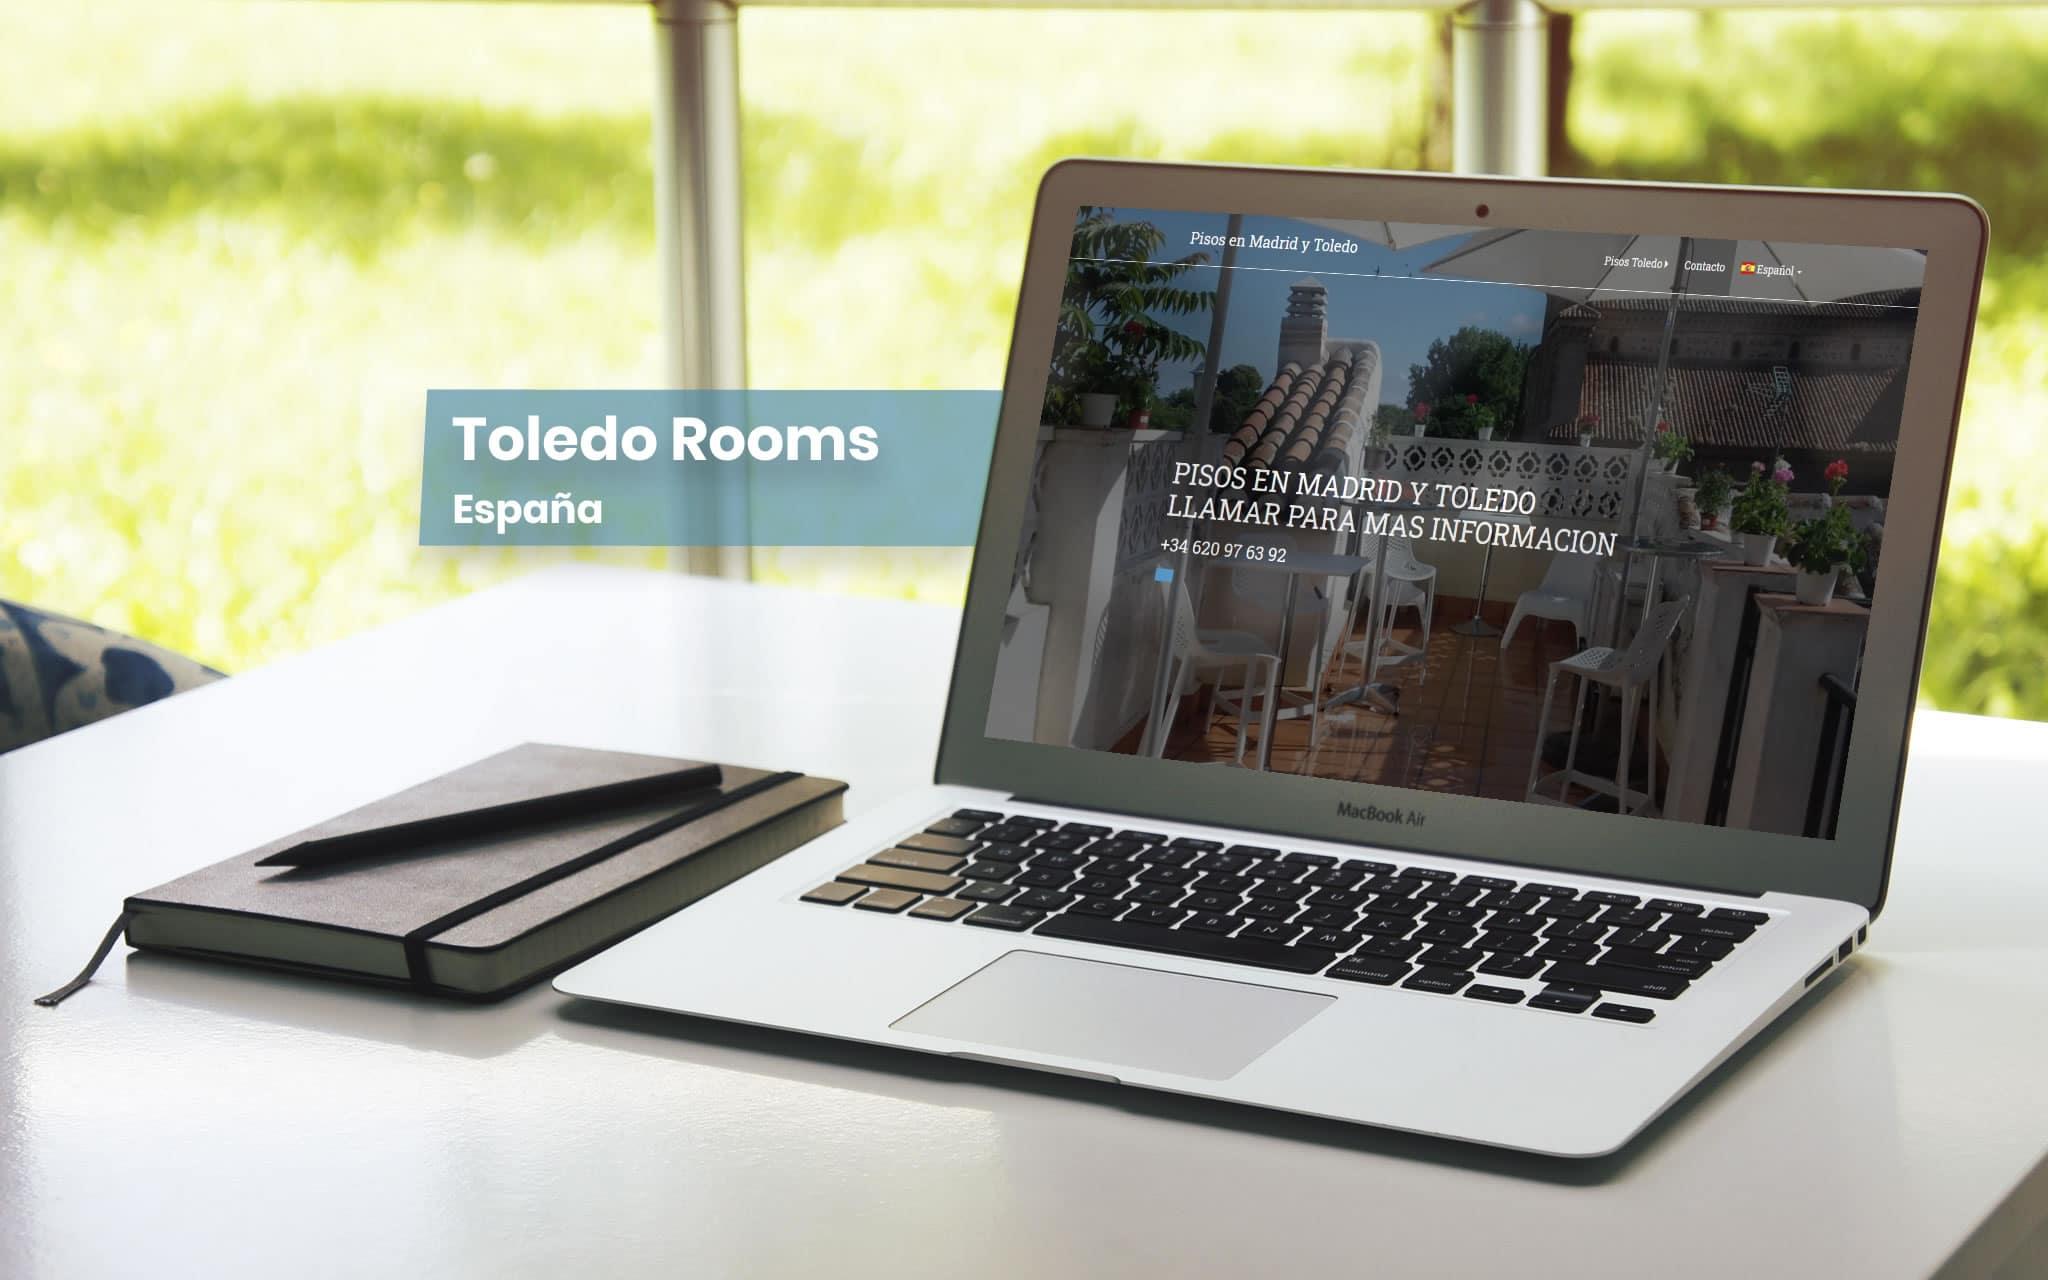 Toledo Rooms - España